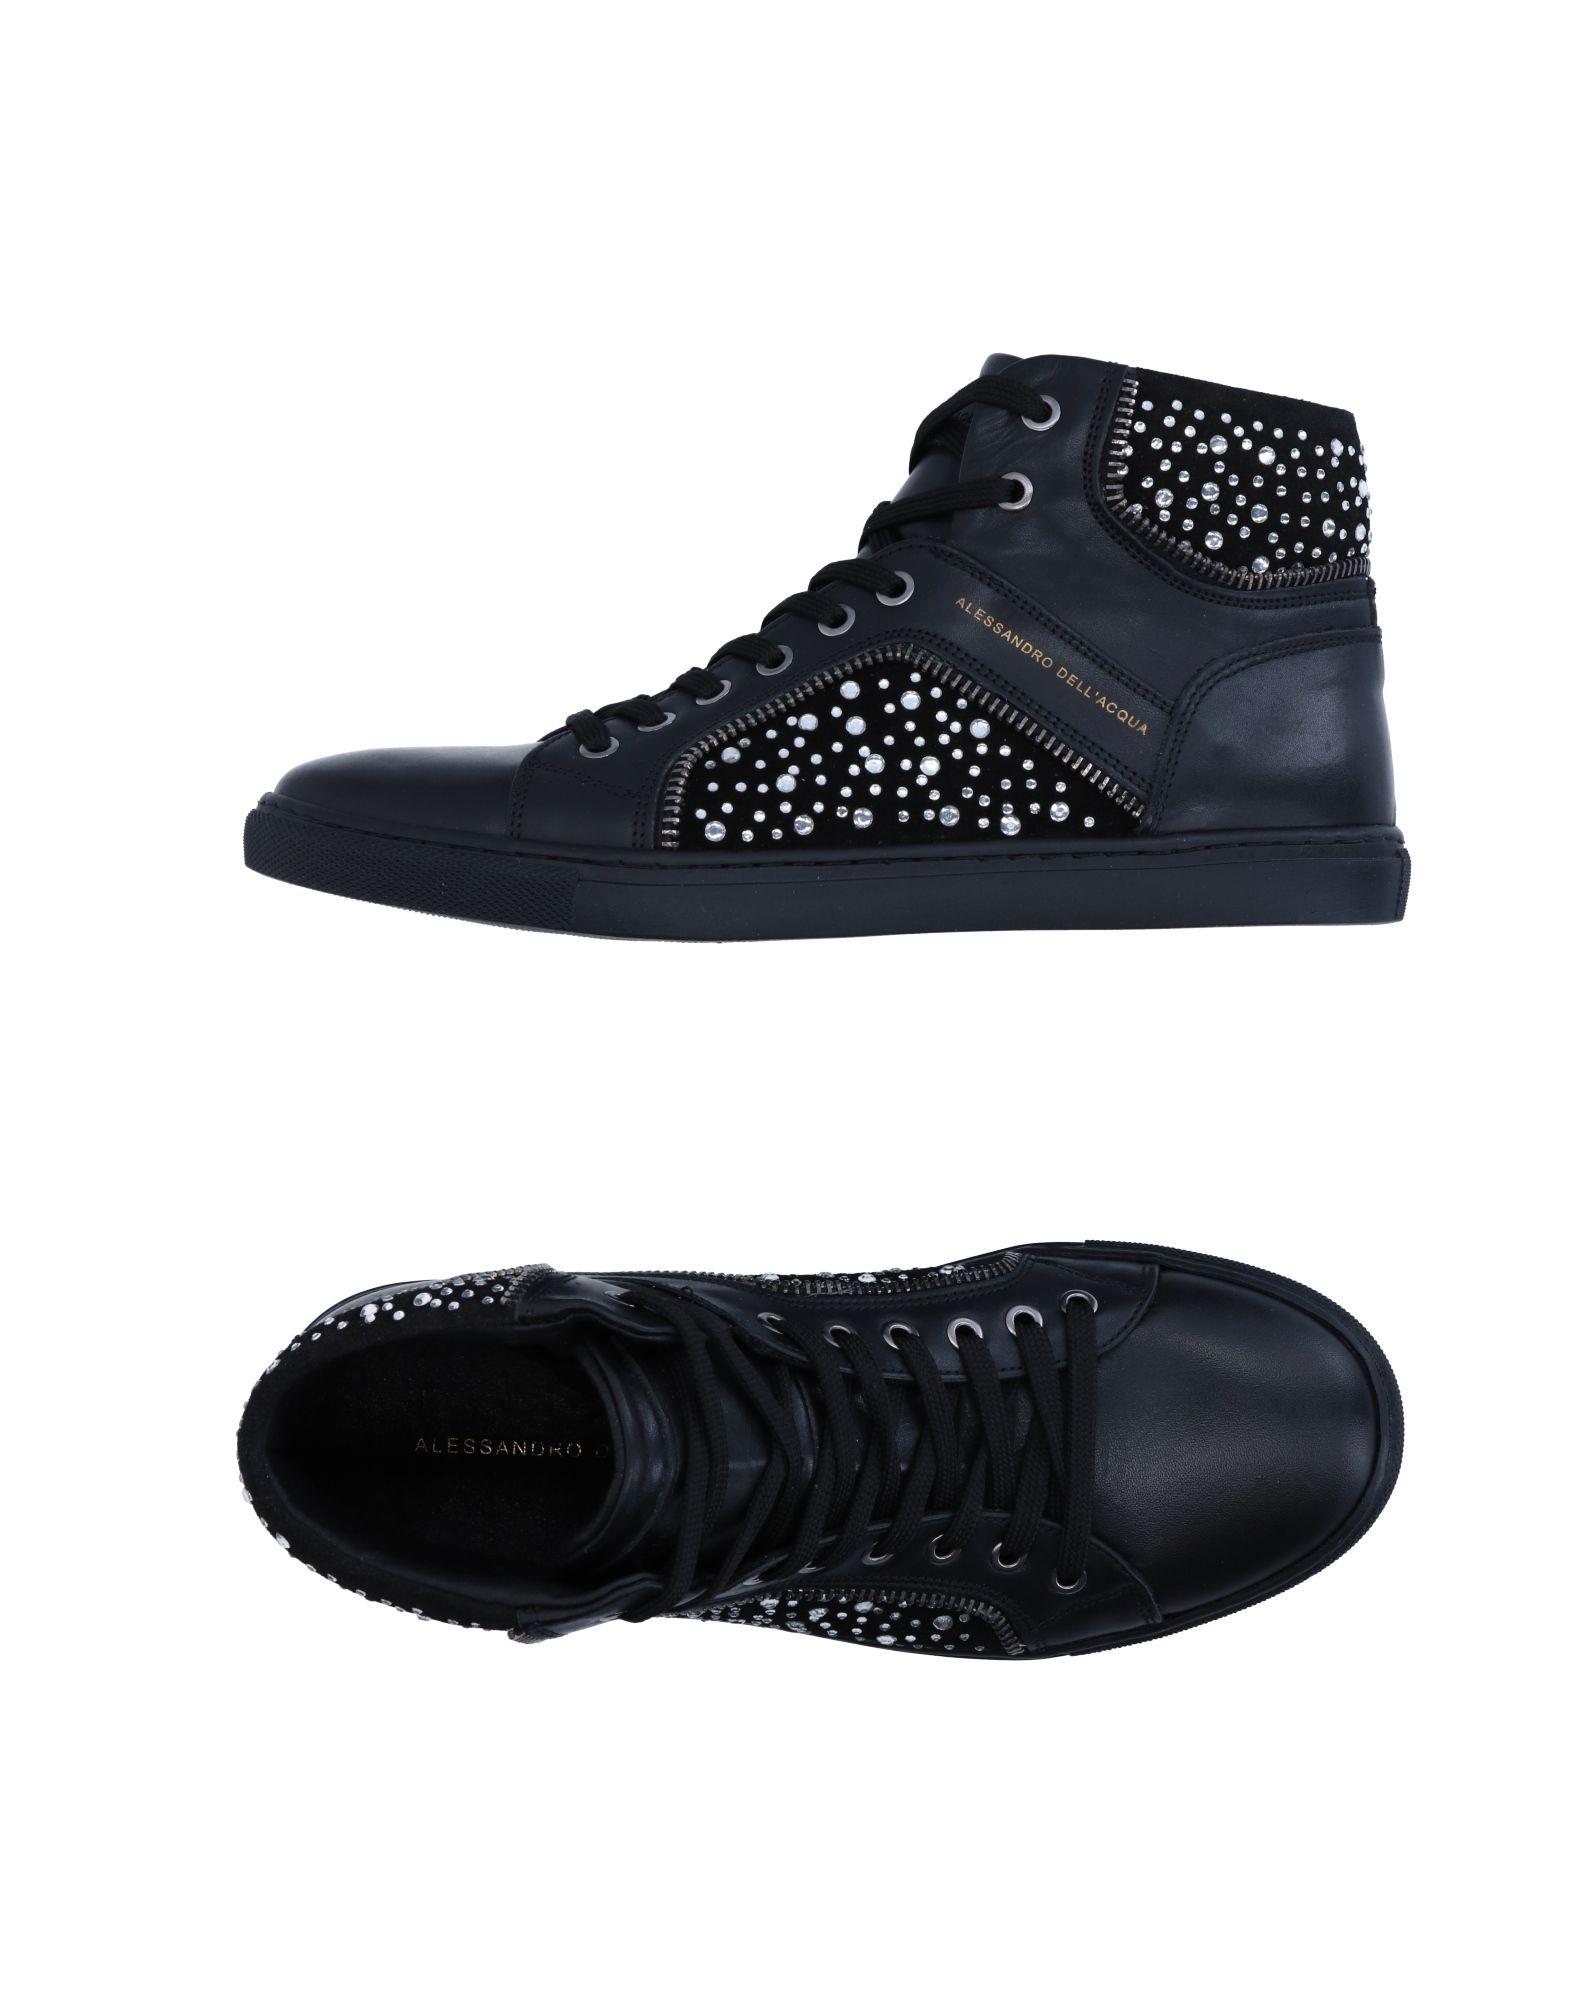 Alessandro Dell Acqua Shoes Reviews